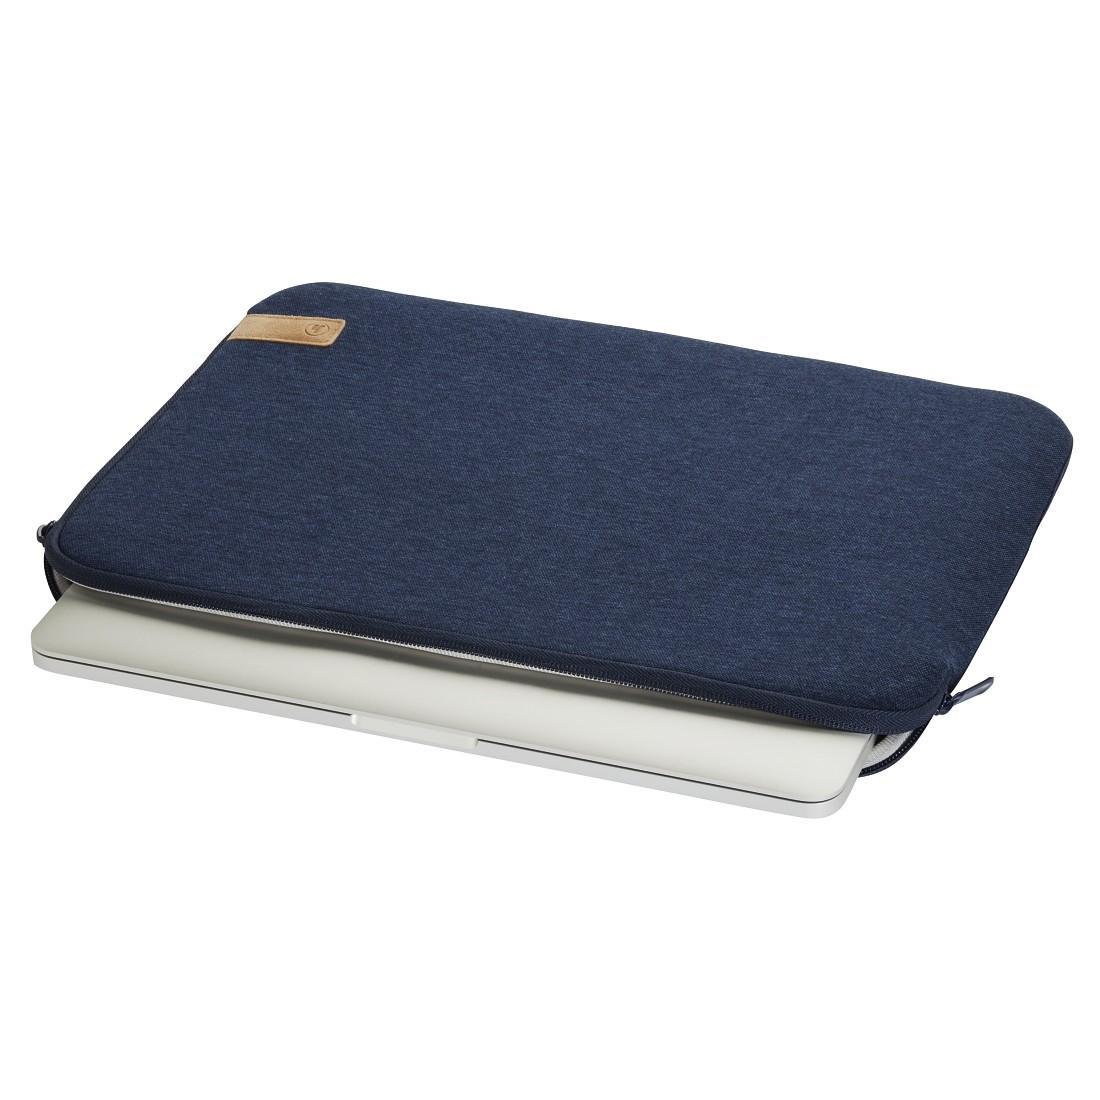 "Универсален калъф за лаптоп HAMA Jersey, до 34 см  (13.3""), Син-2"